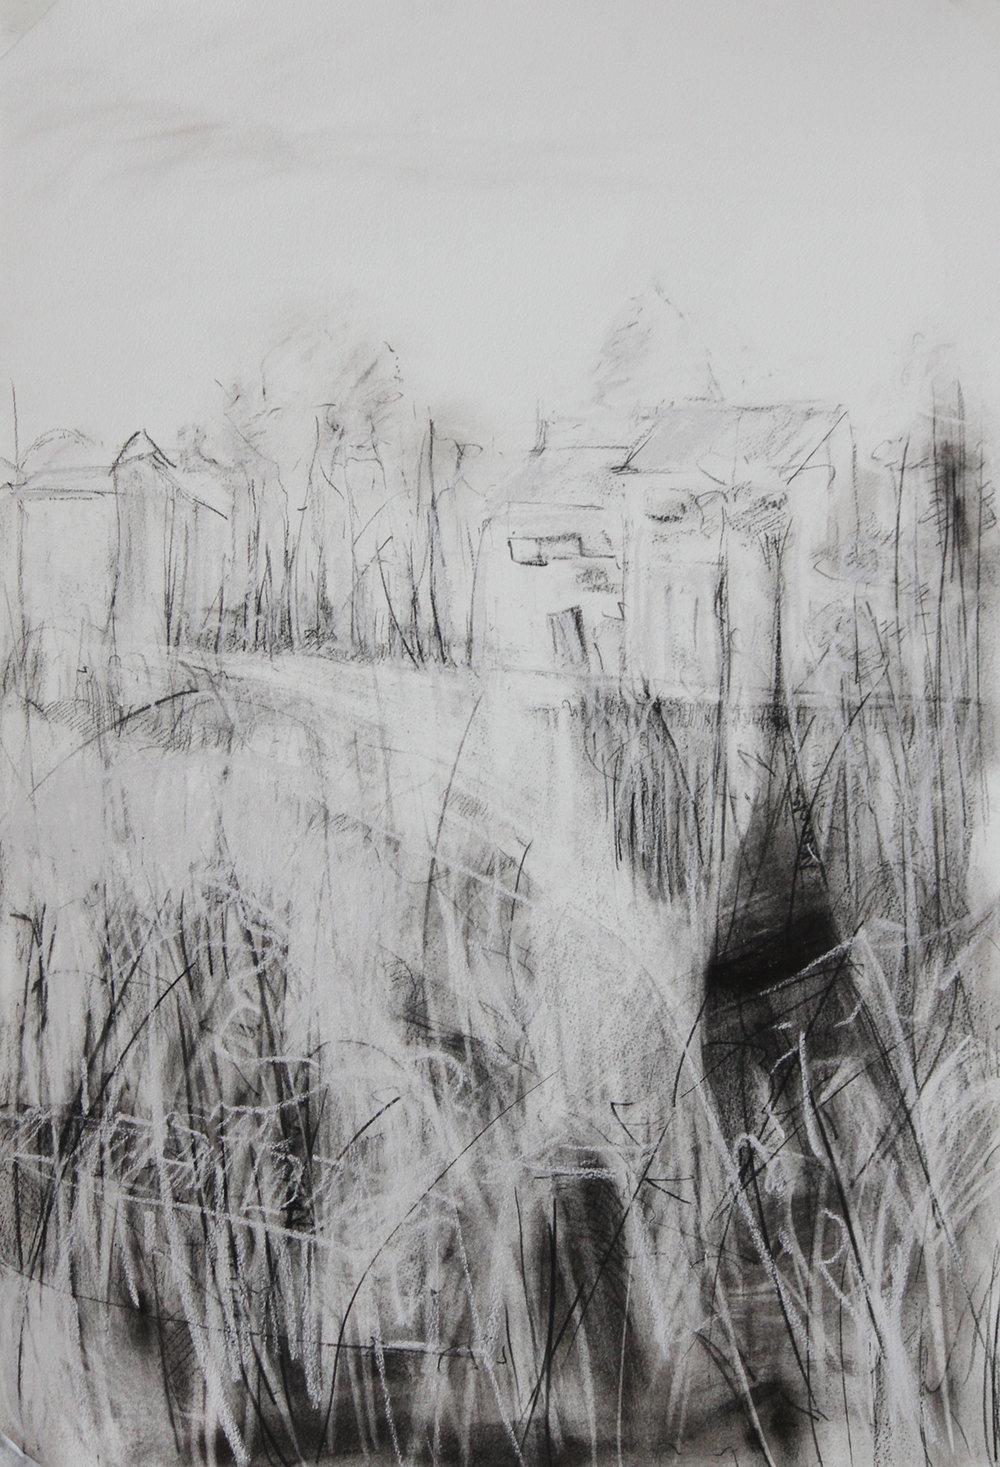 TITLE: Bleak edge of winter 2  MEDIUM:Charcoal, graphite, on paper DIMENSIONS: H76 x W53cm